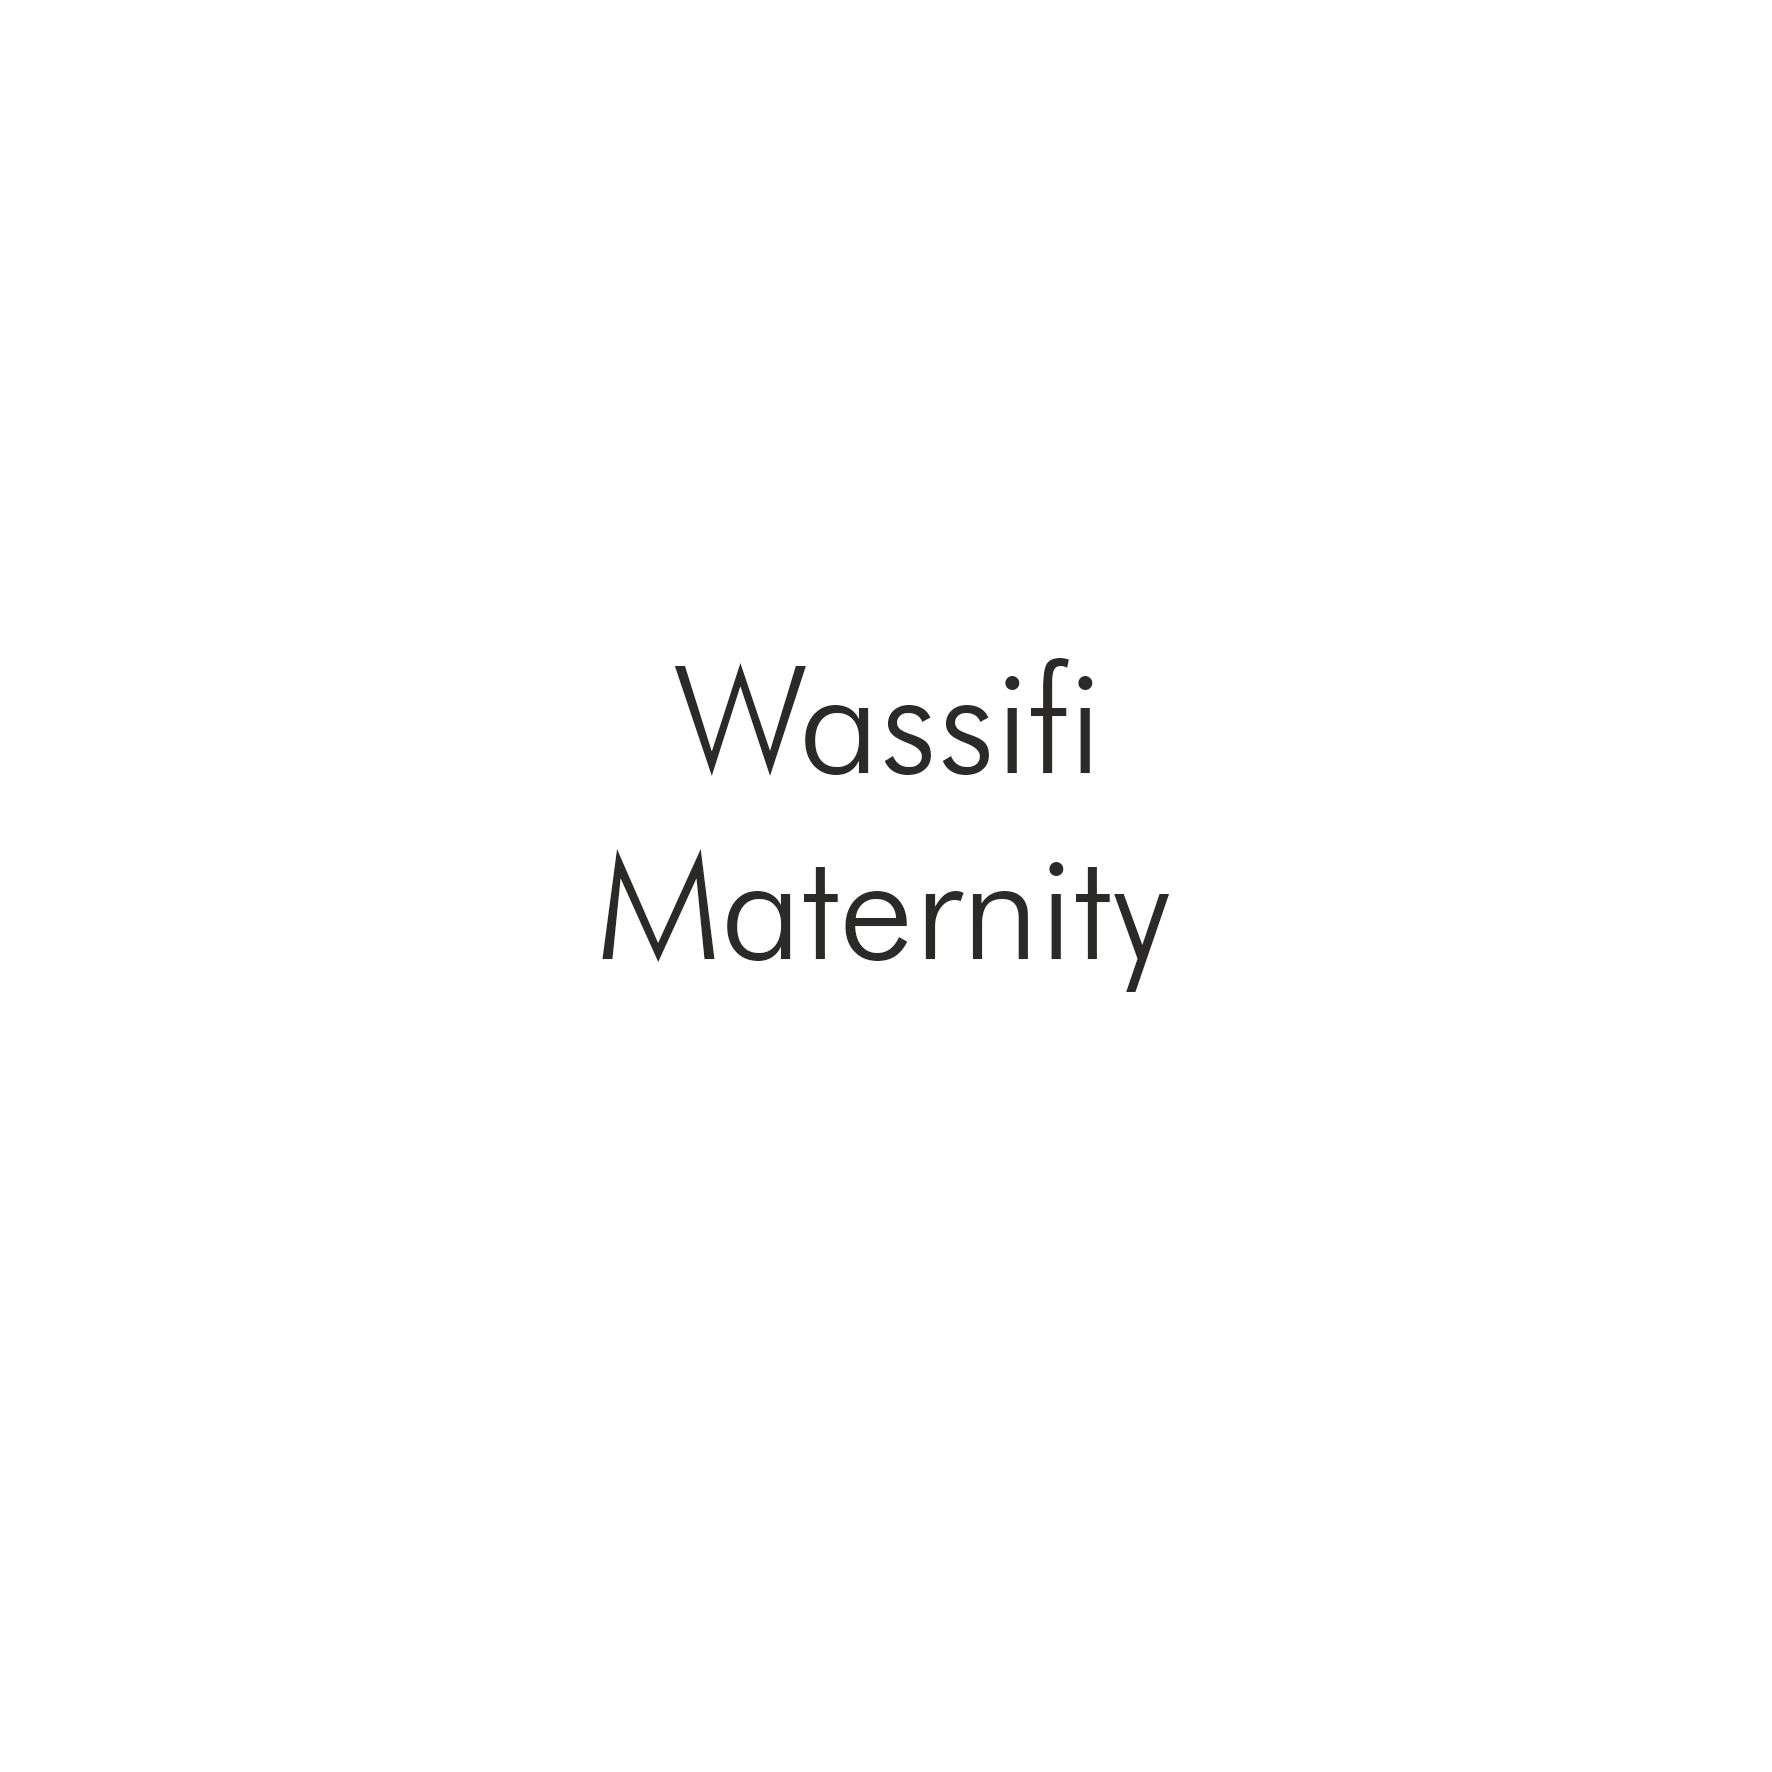 Wassifi Maternity.png